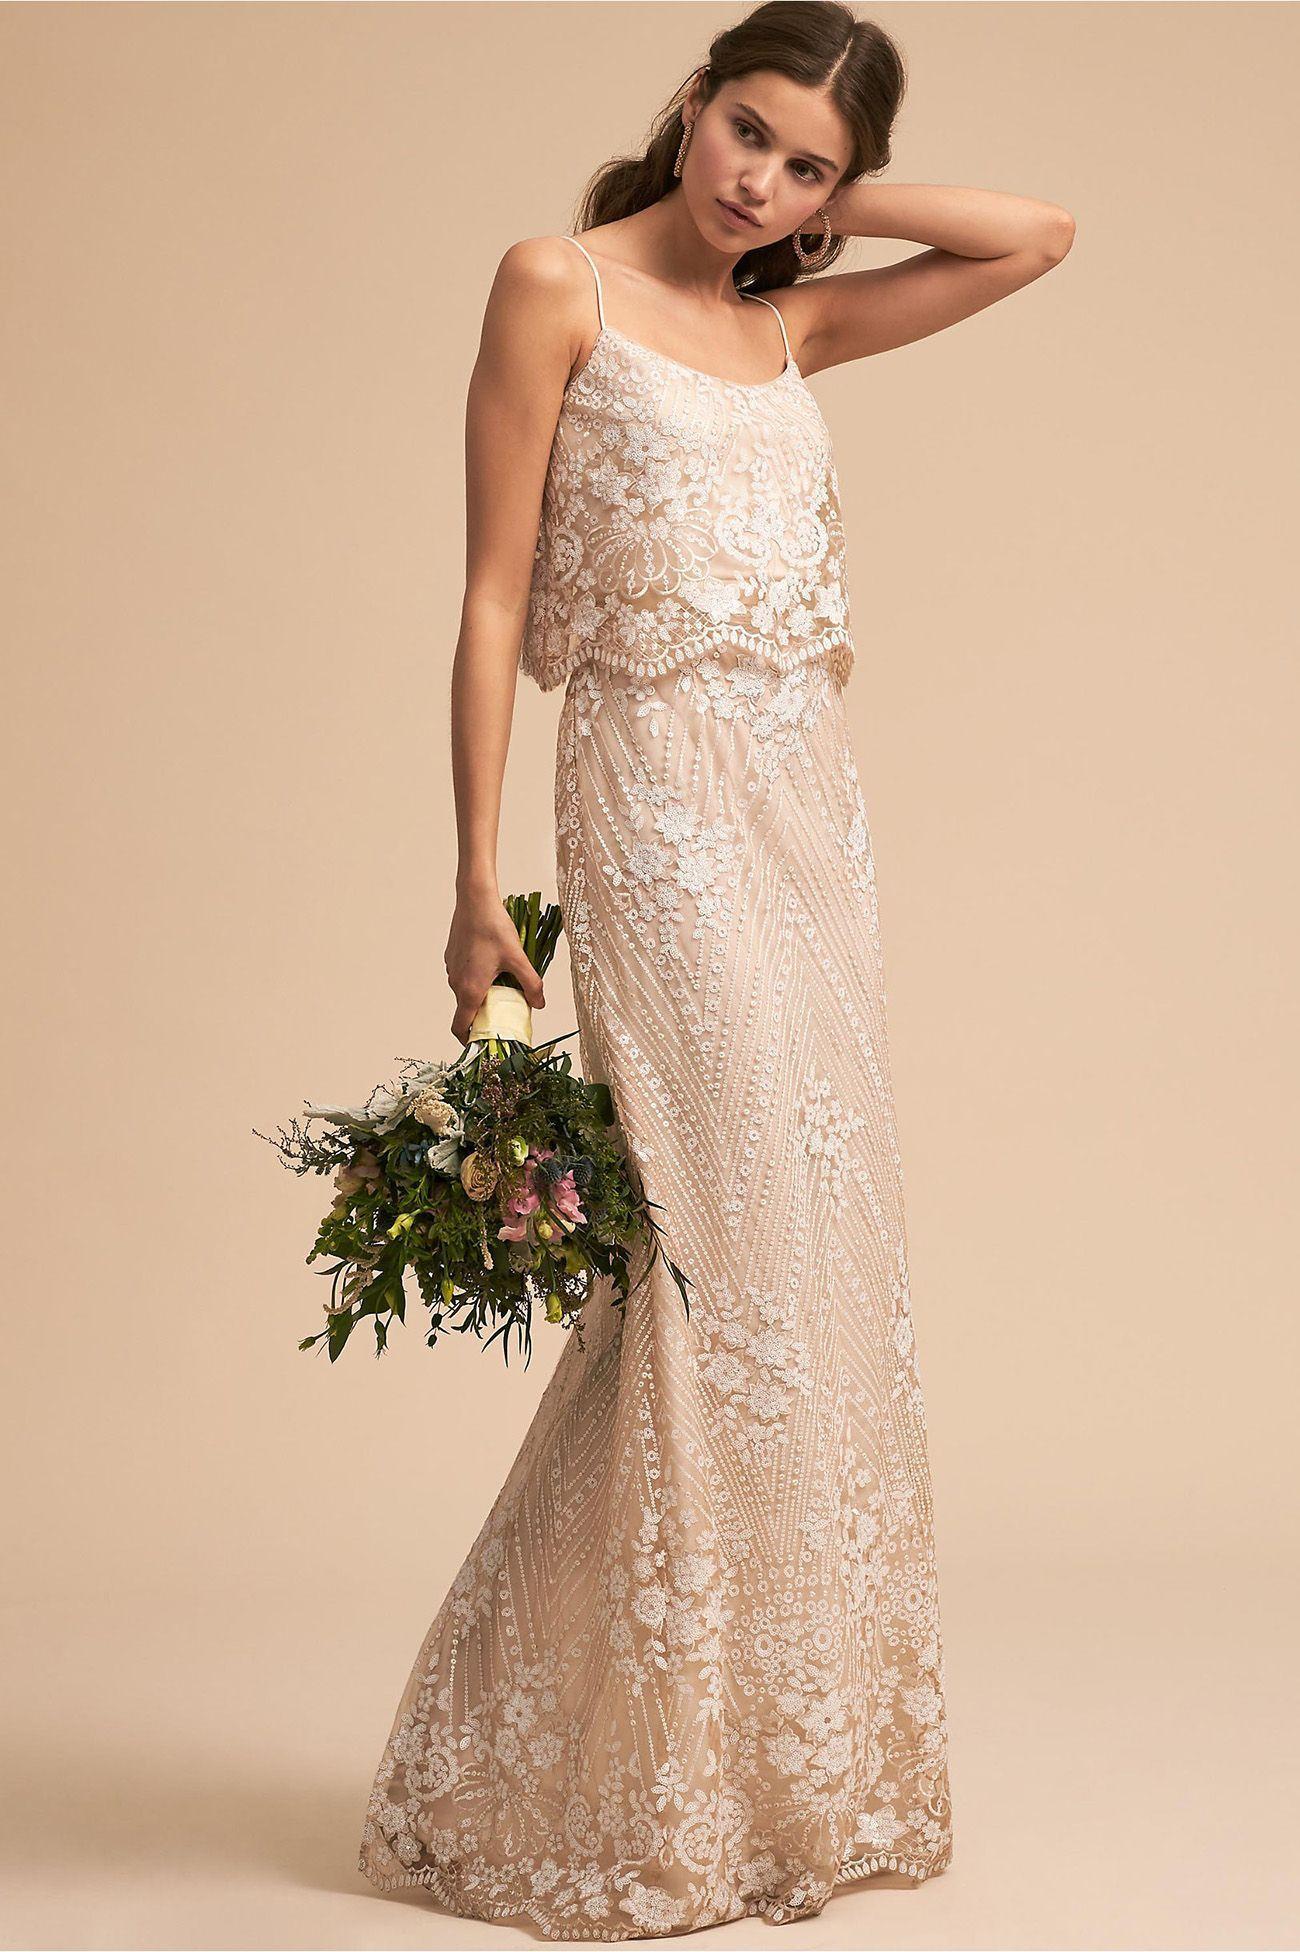 Our Favorite Wedding Dresses Under $500! - Green Wedding Shoes ...